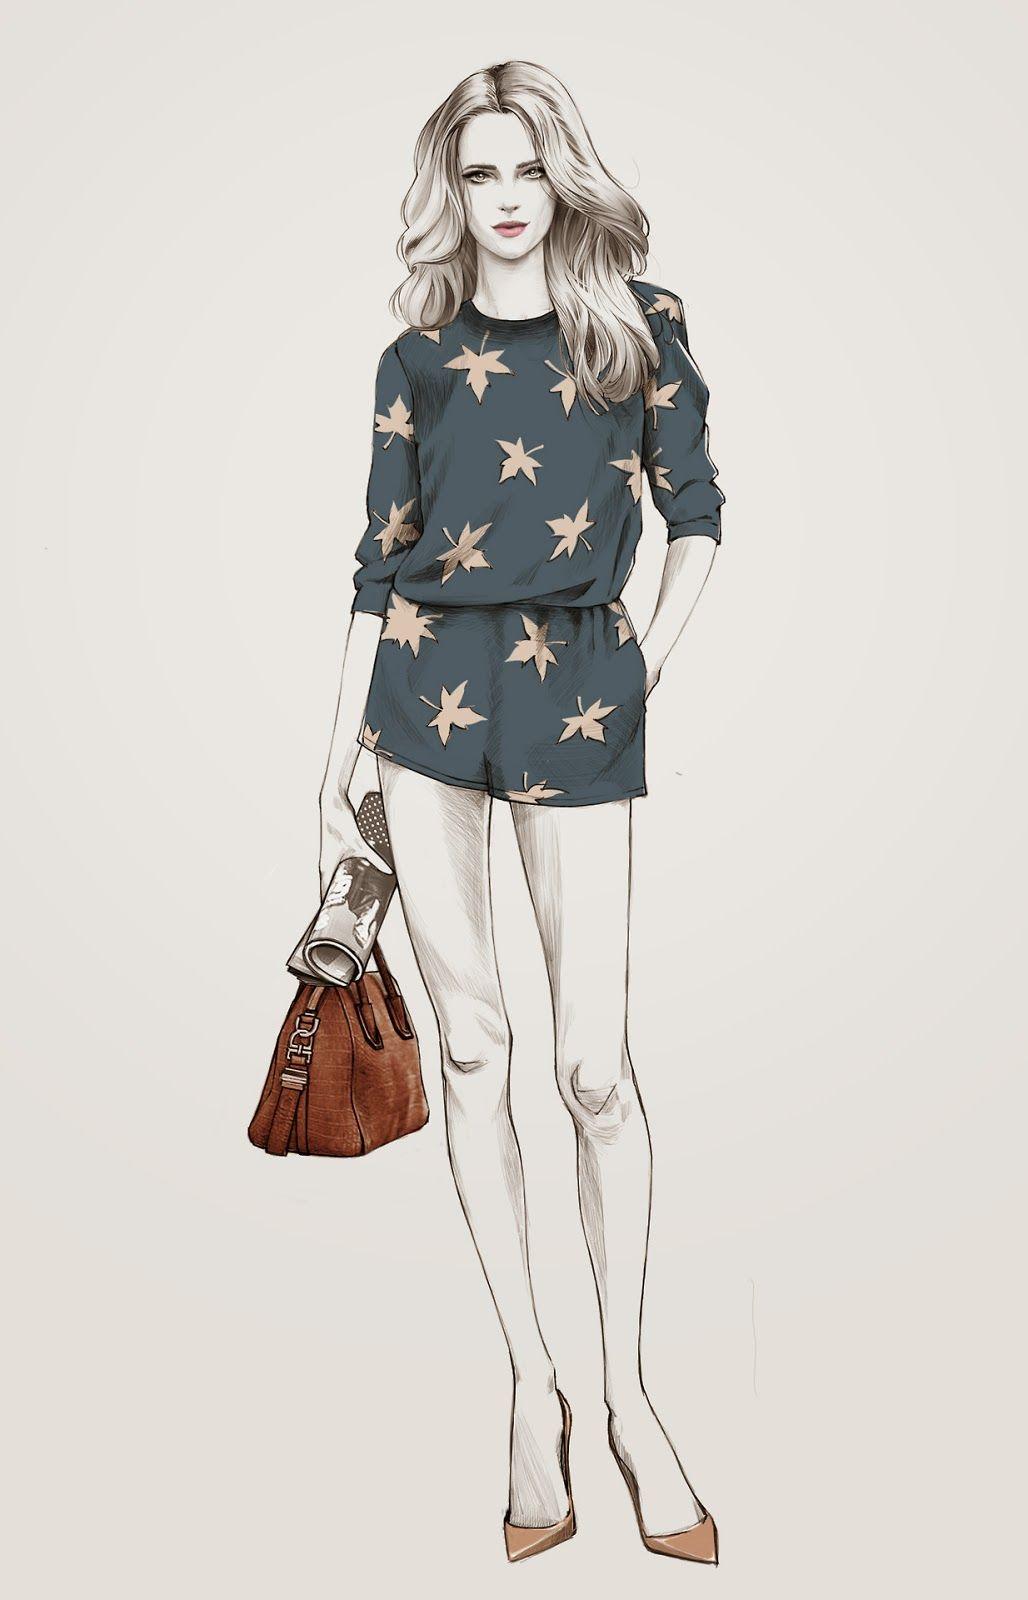 Qiu hao fashion designer 55